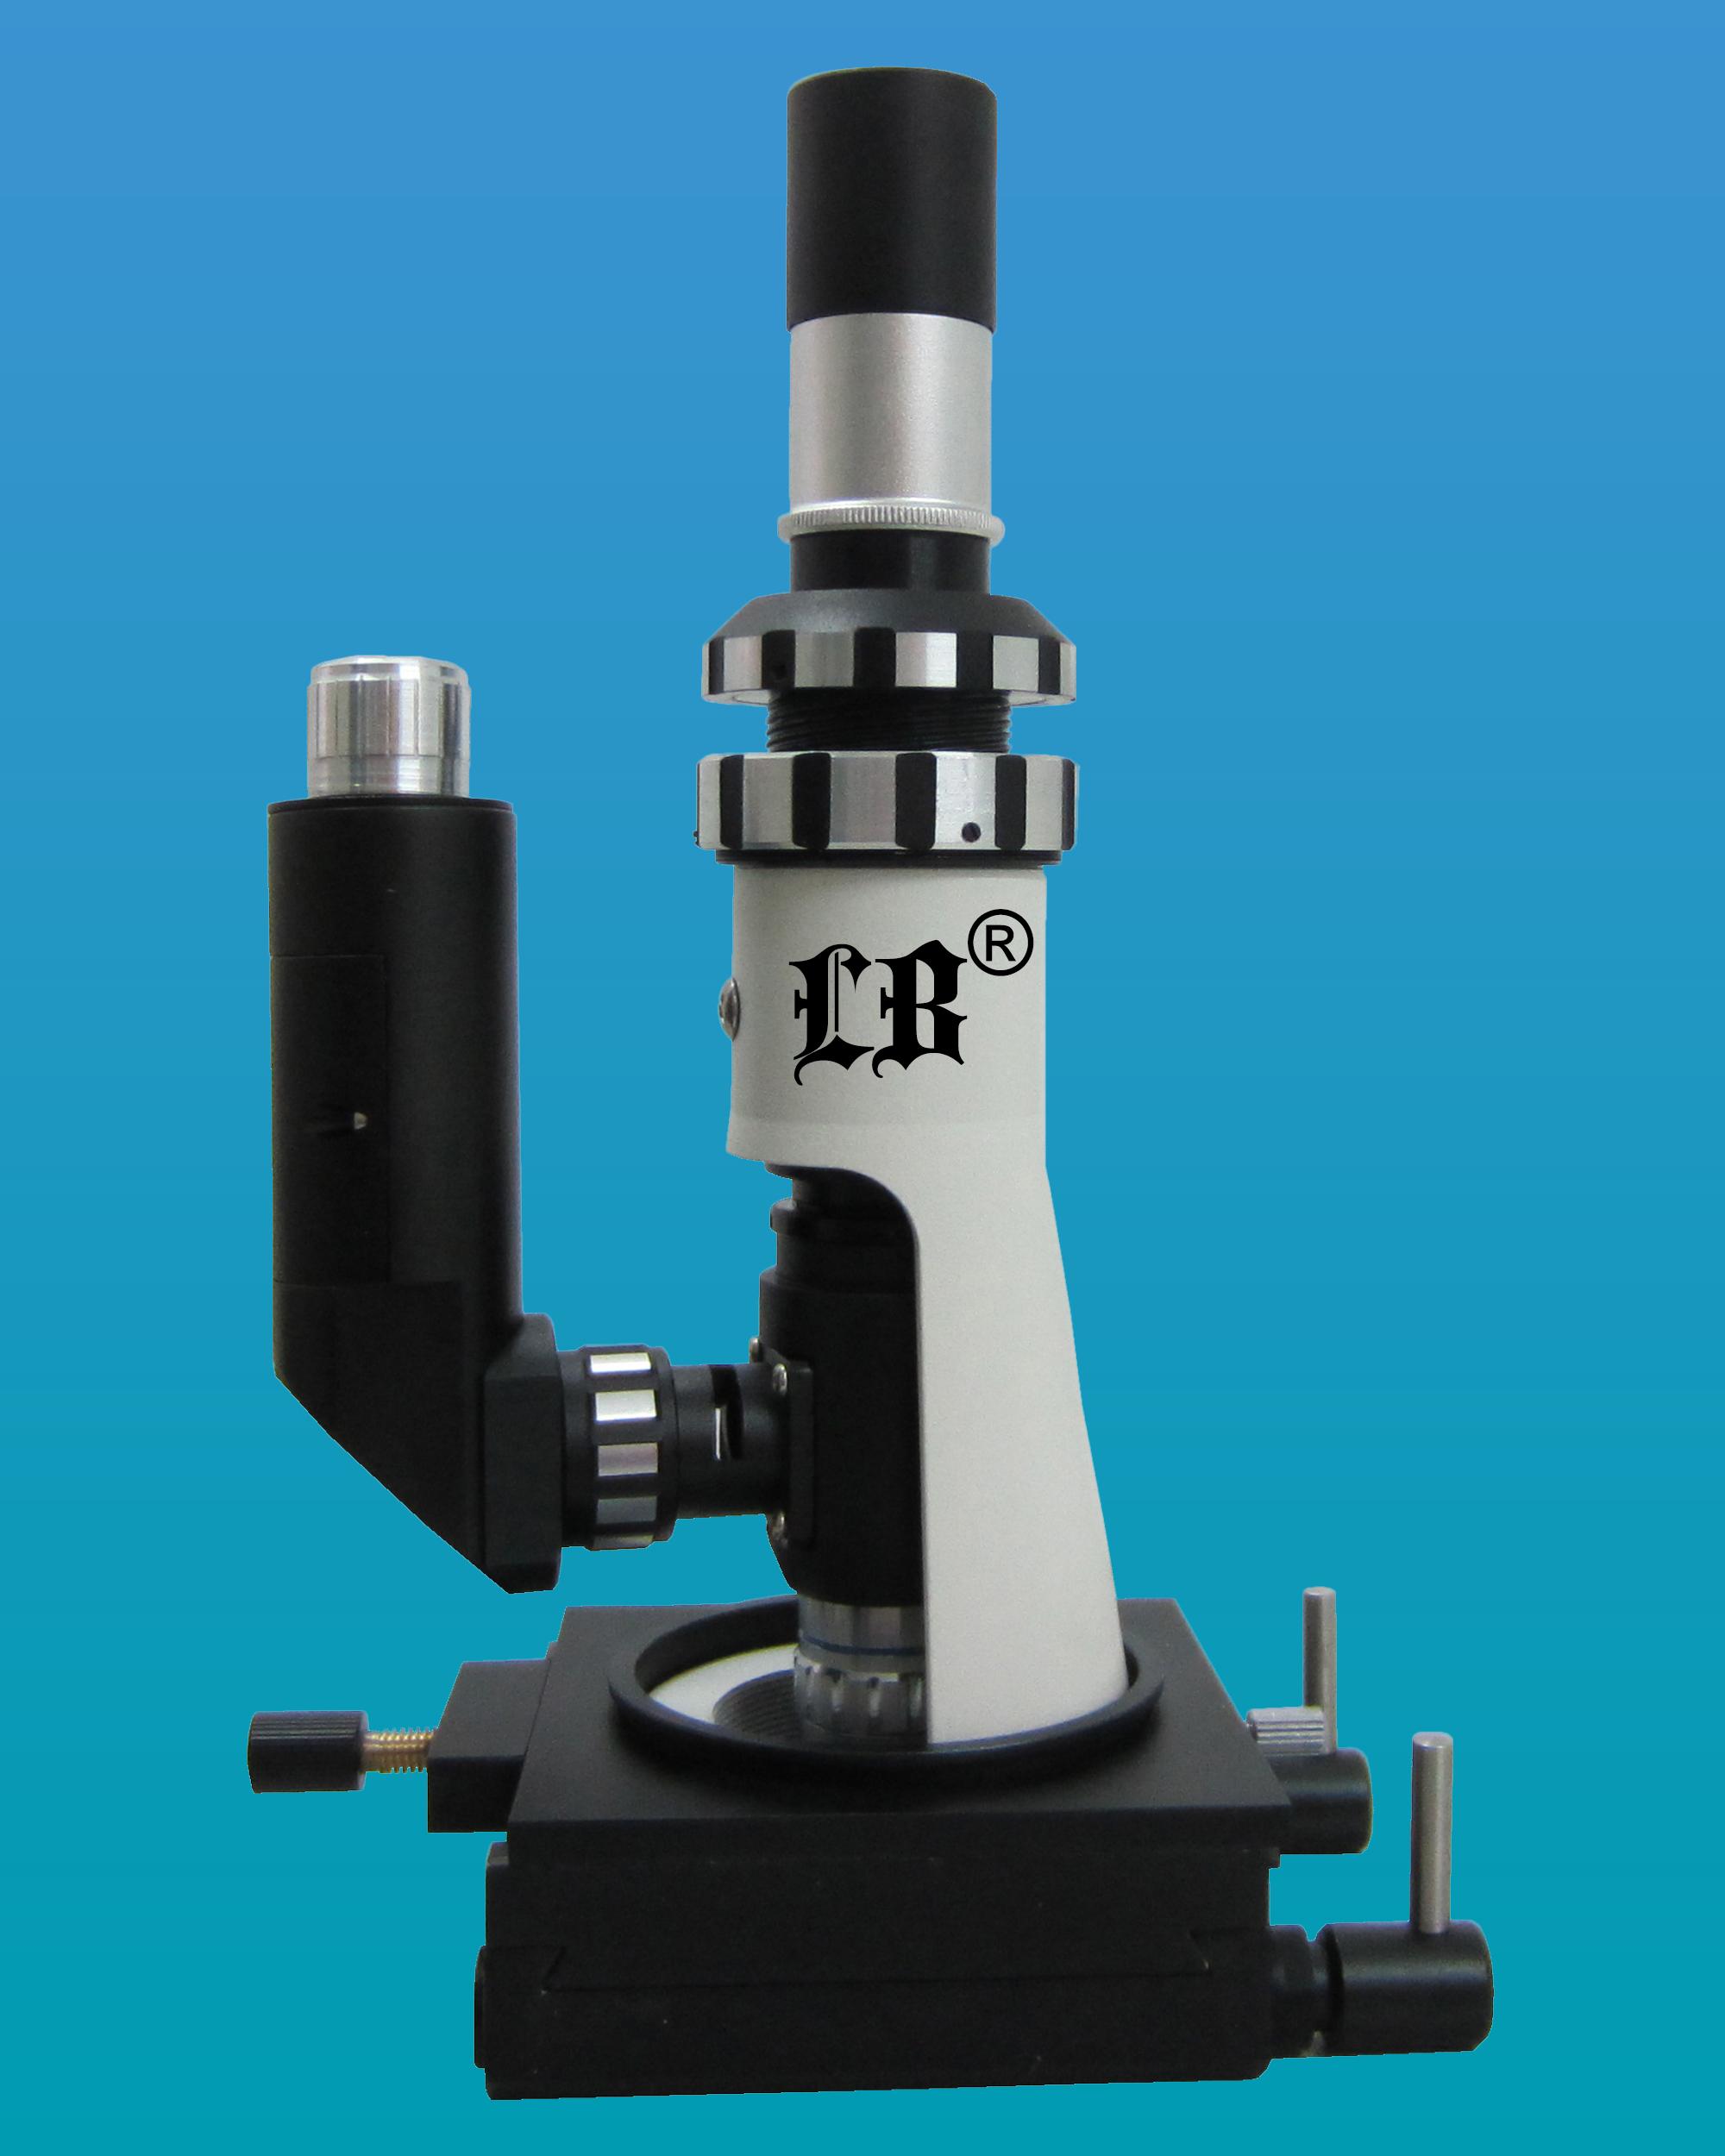 [LB-606] Portable Metallurgical Microscope w/ Magnetic Base, Plan Eyepiece & LED